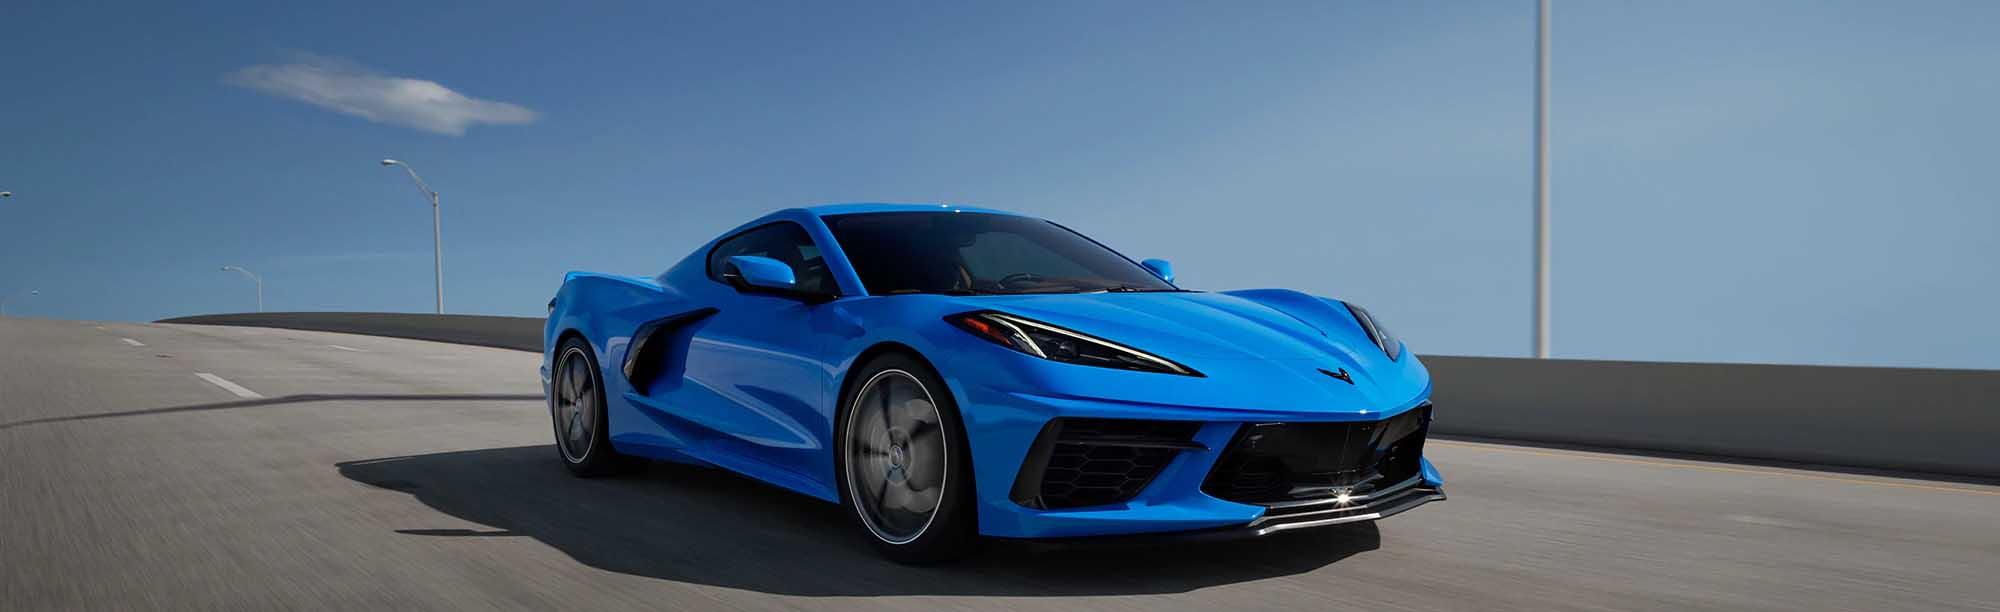 2020 Corvette On Road